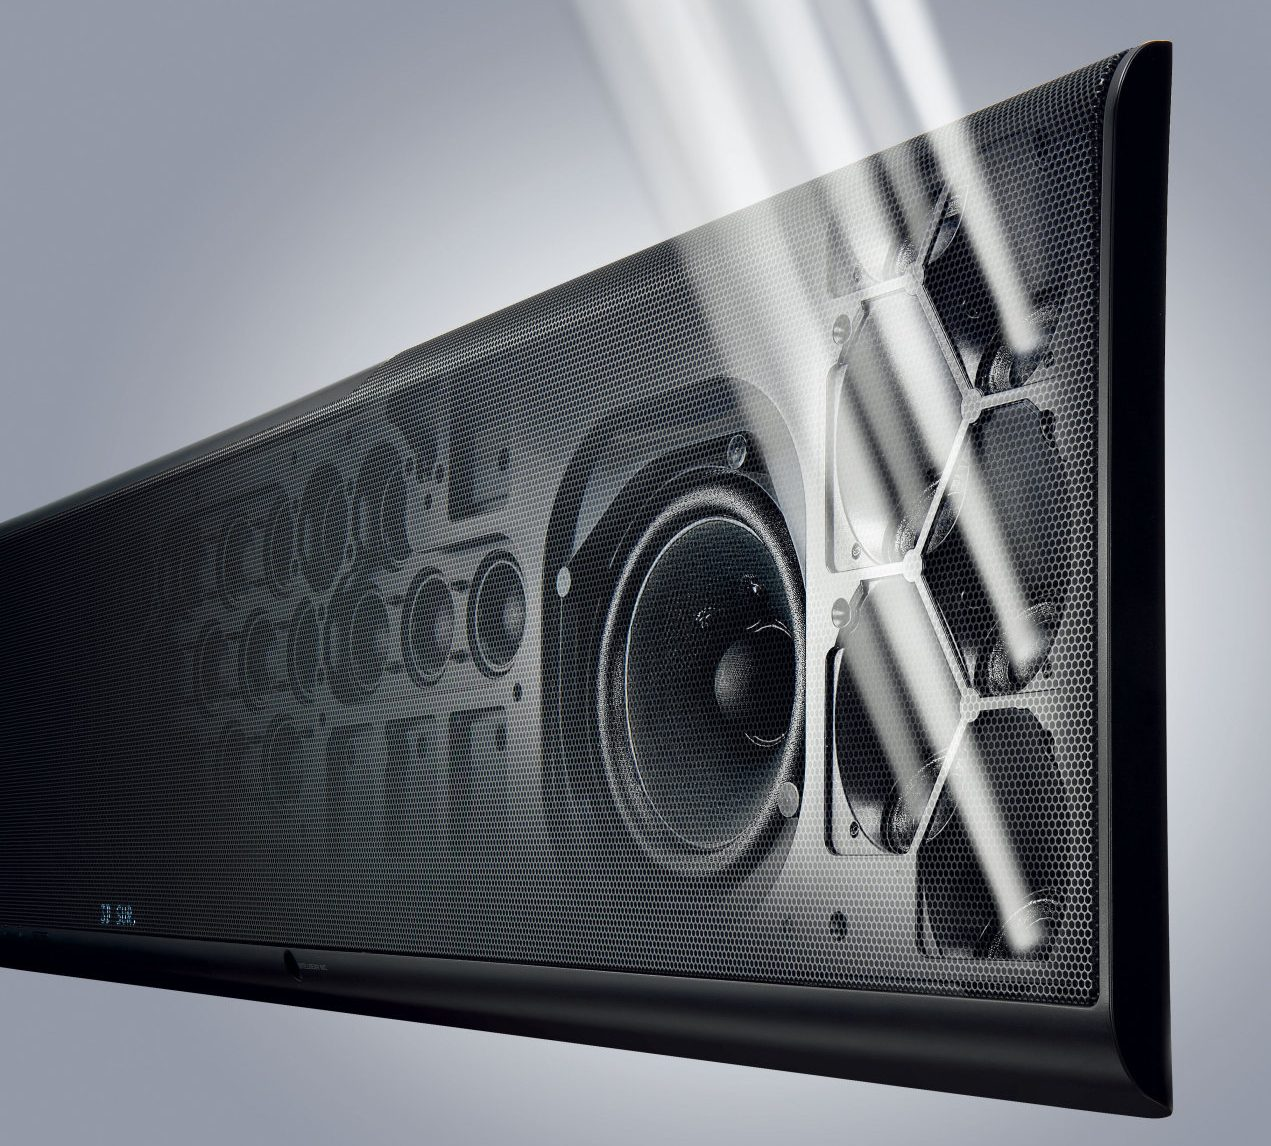 soundbar geluidsprojector plafond 3d-sound